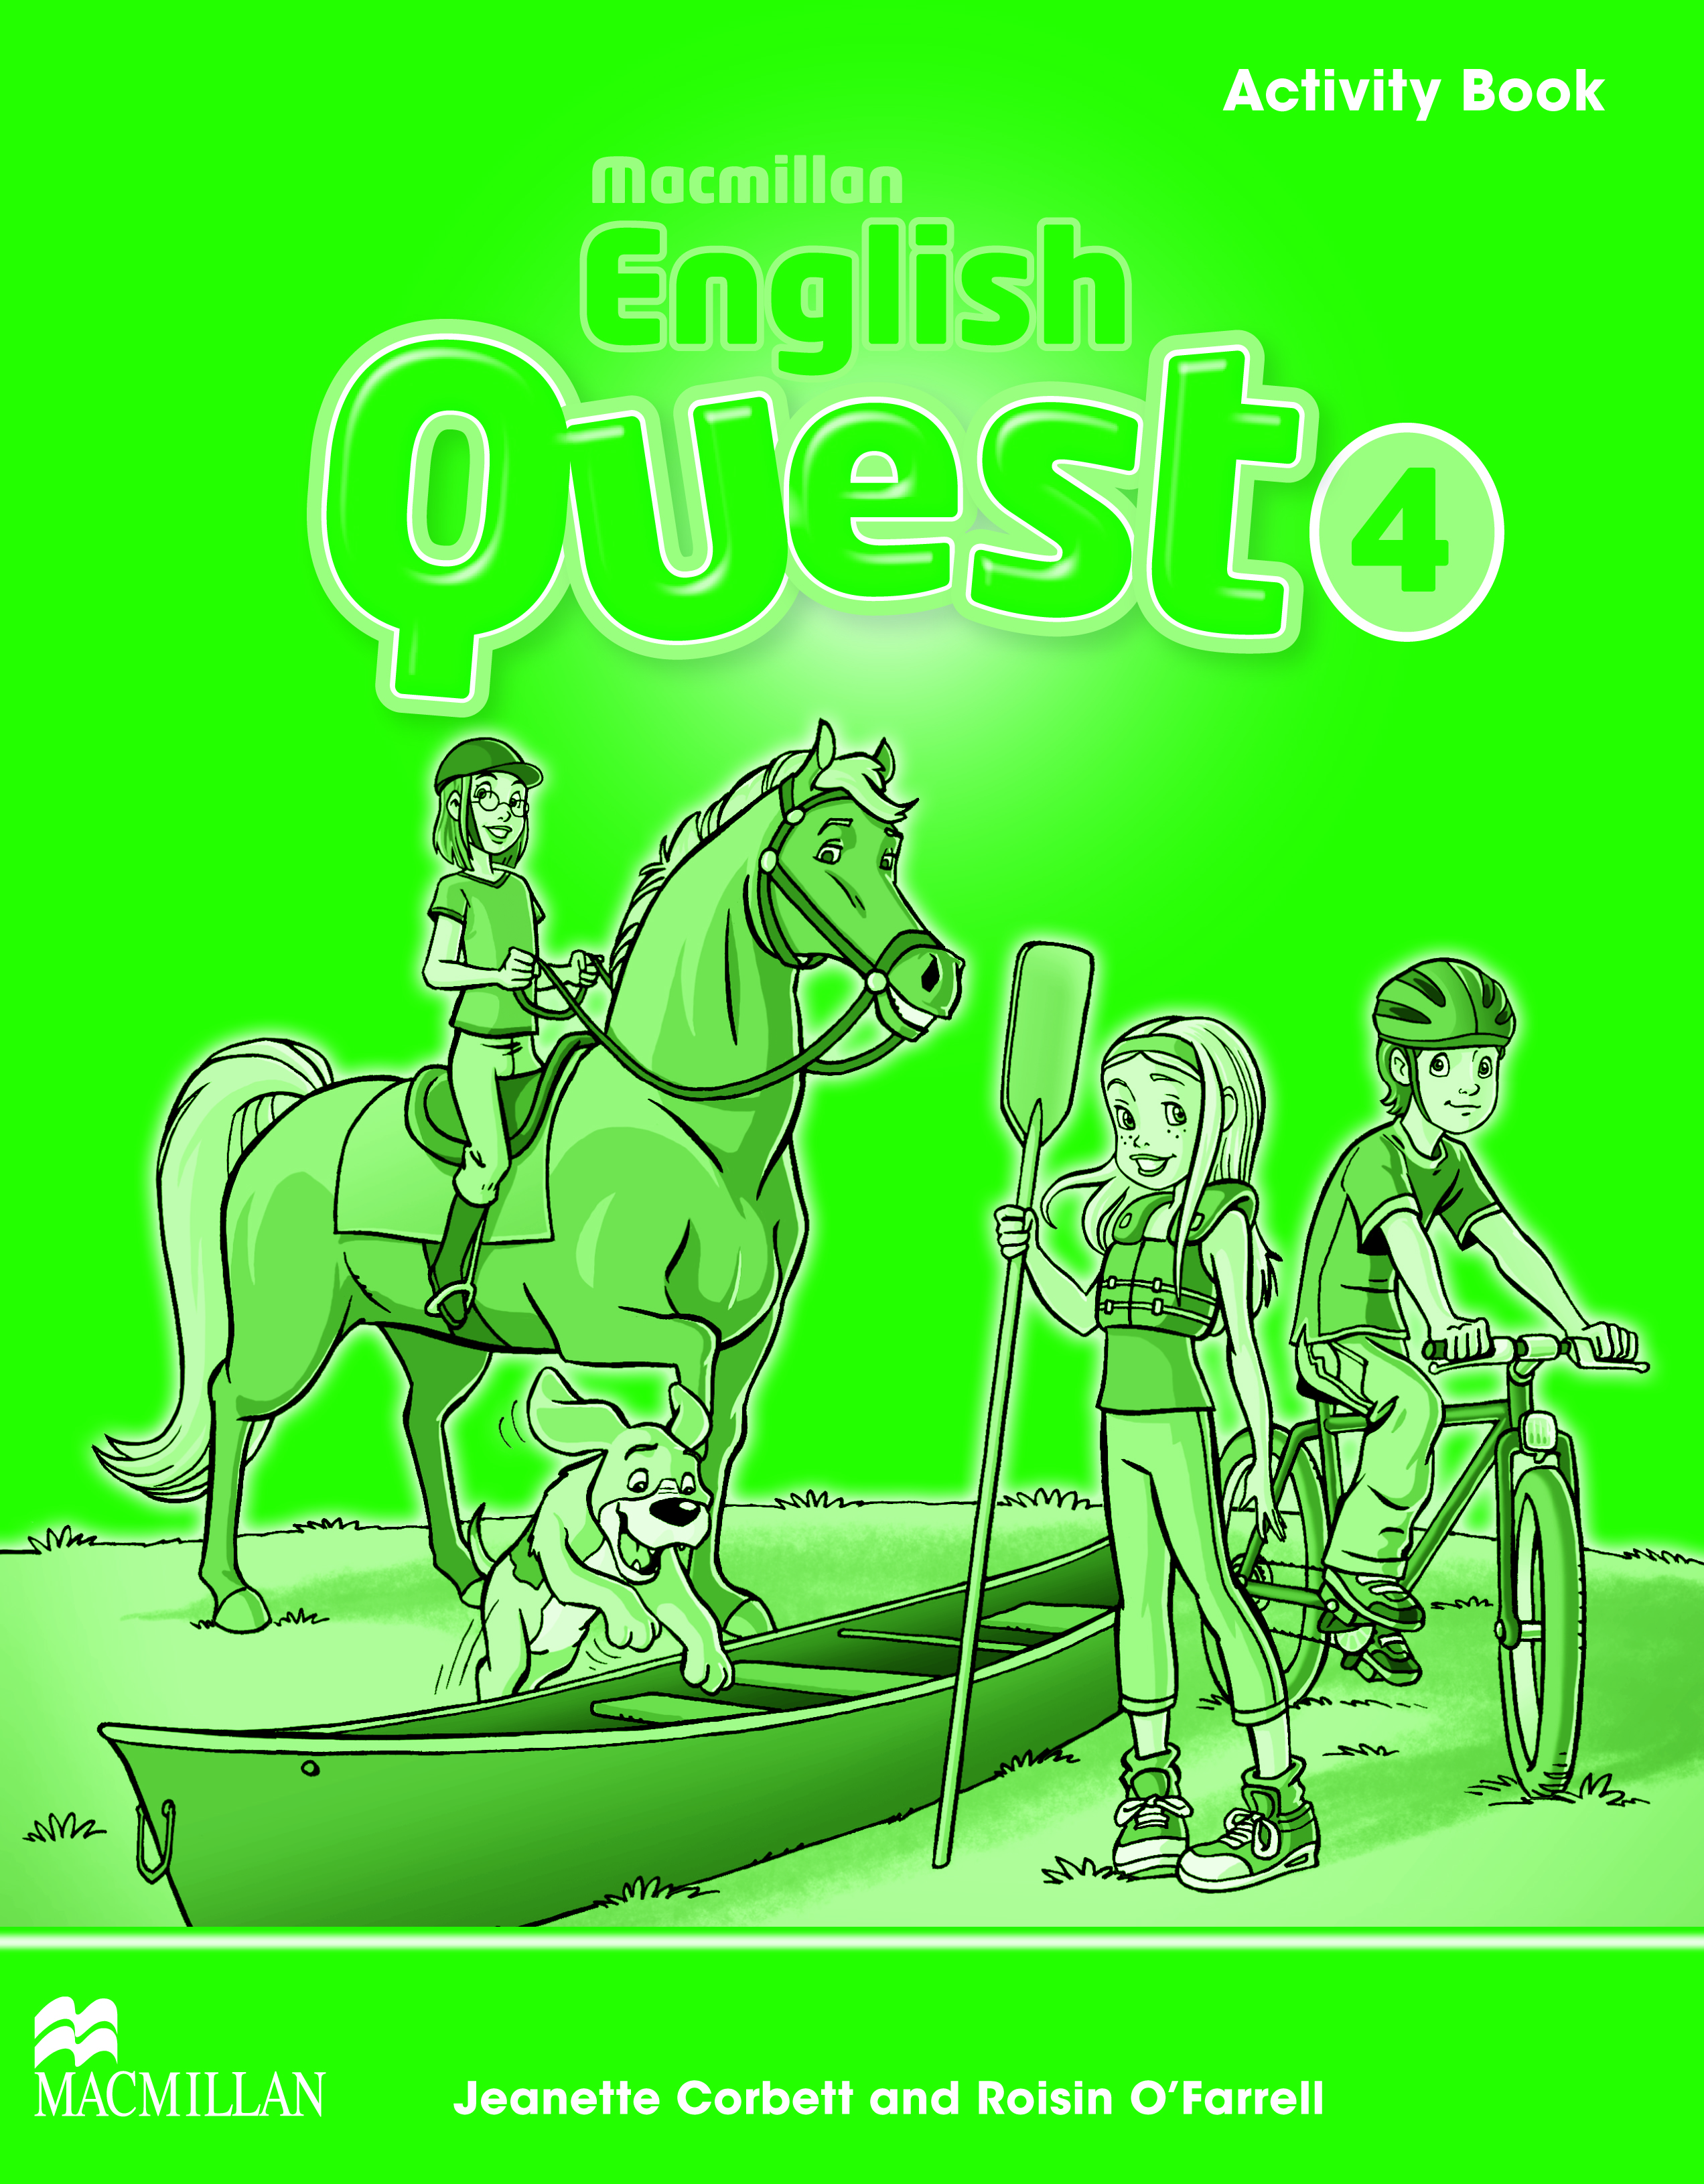 Macmillan English Quest 4 Activity Book